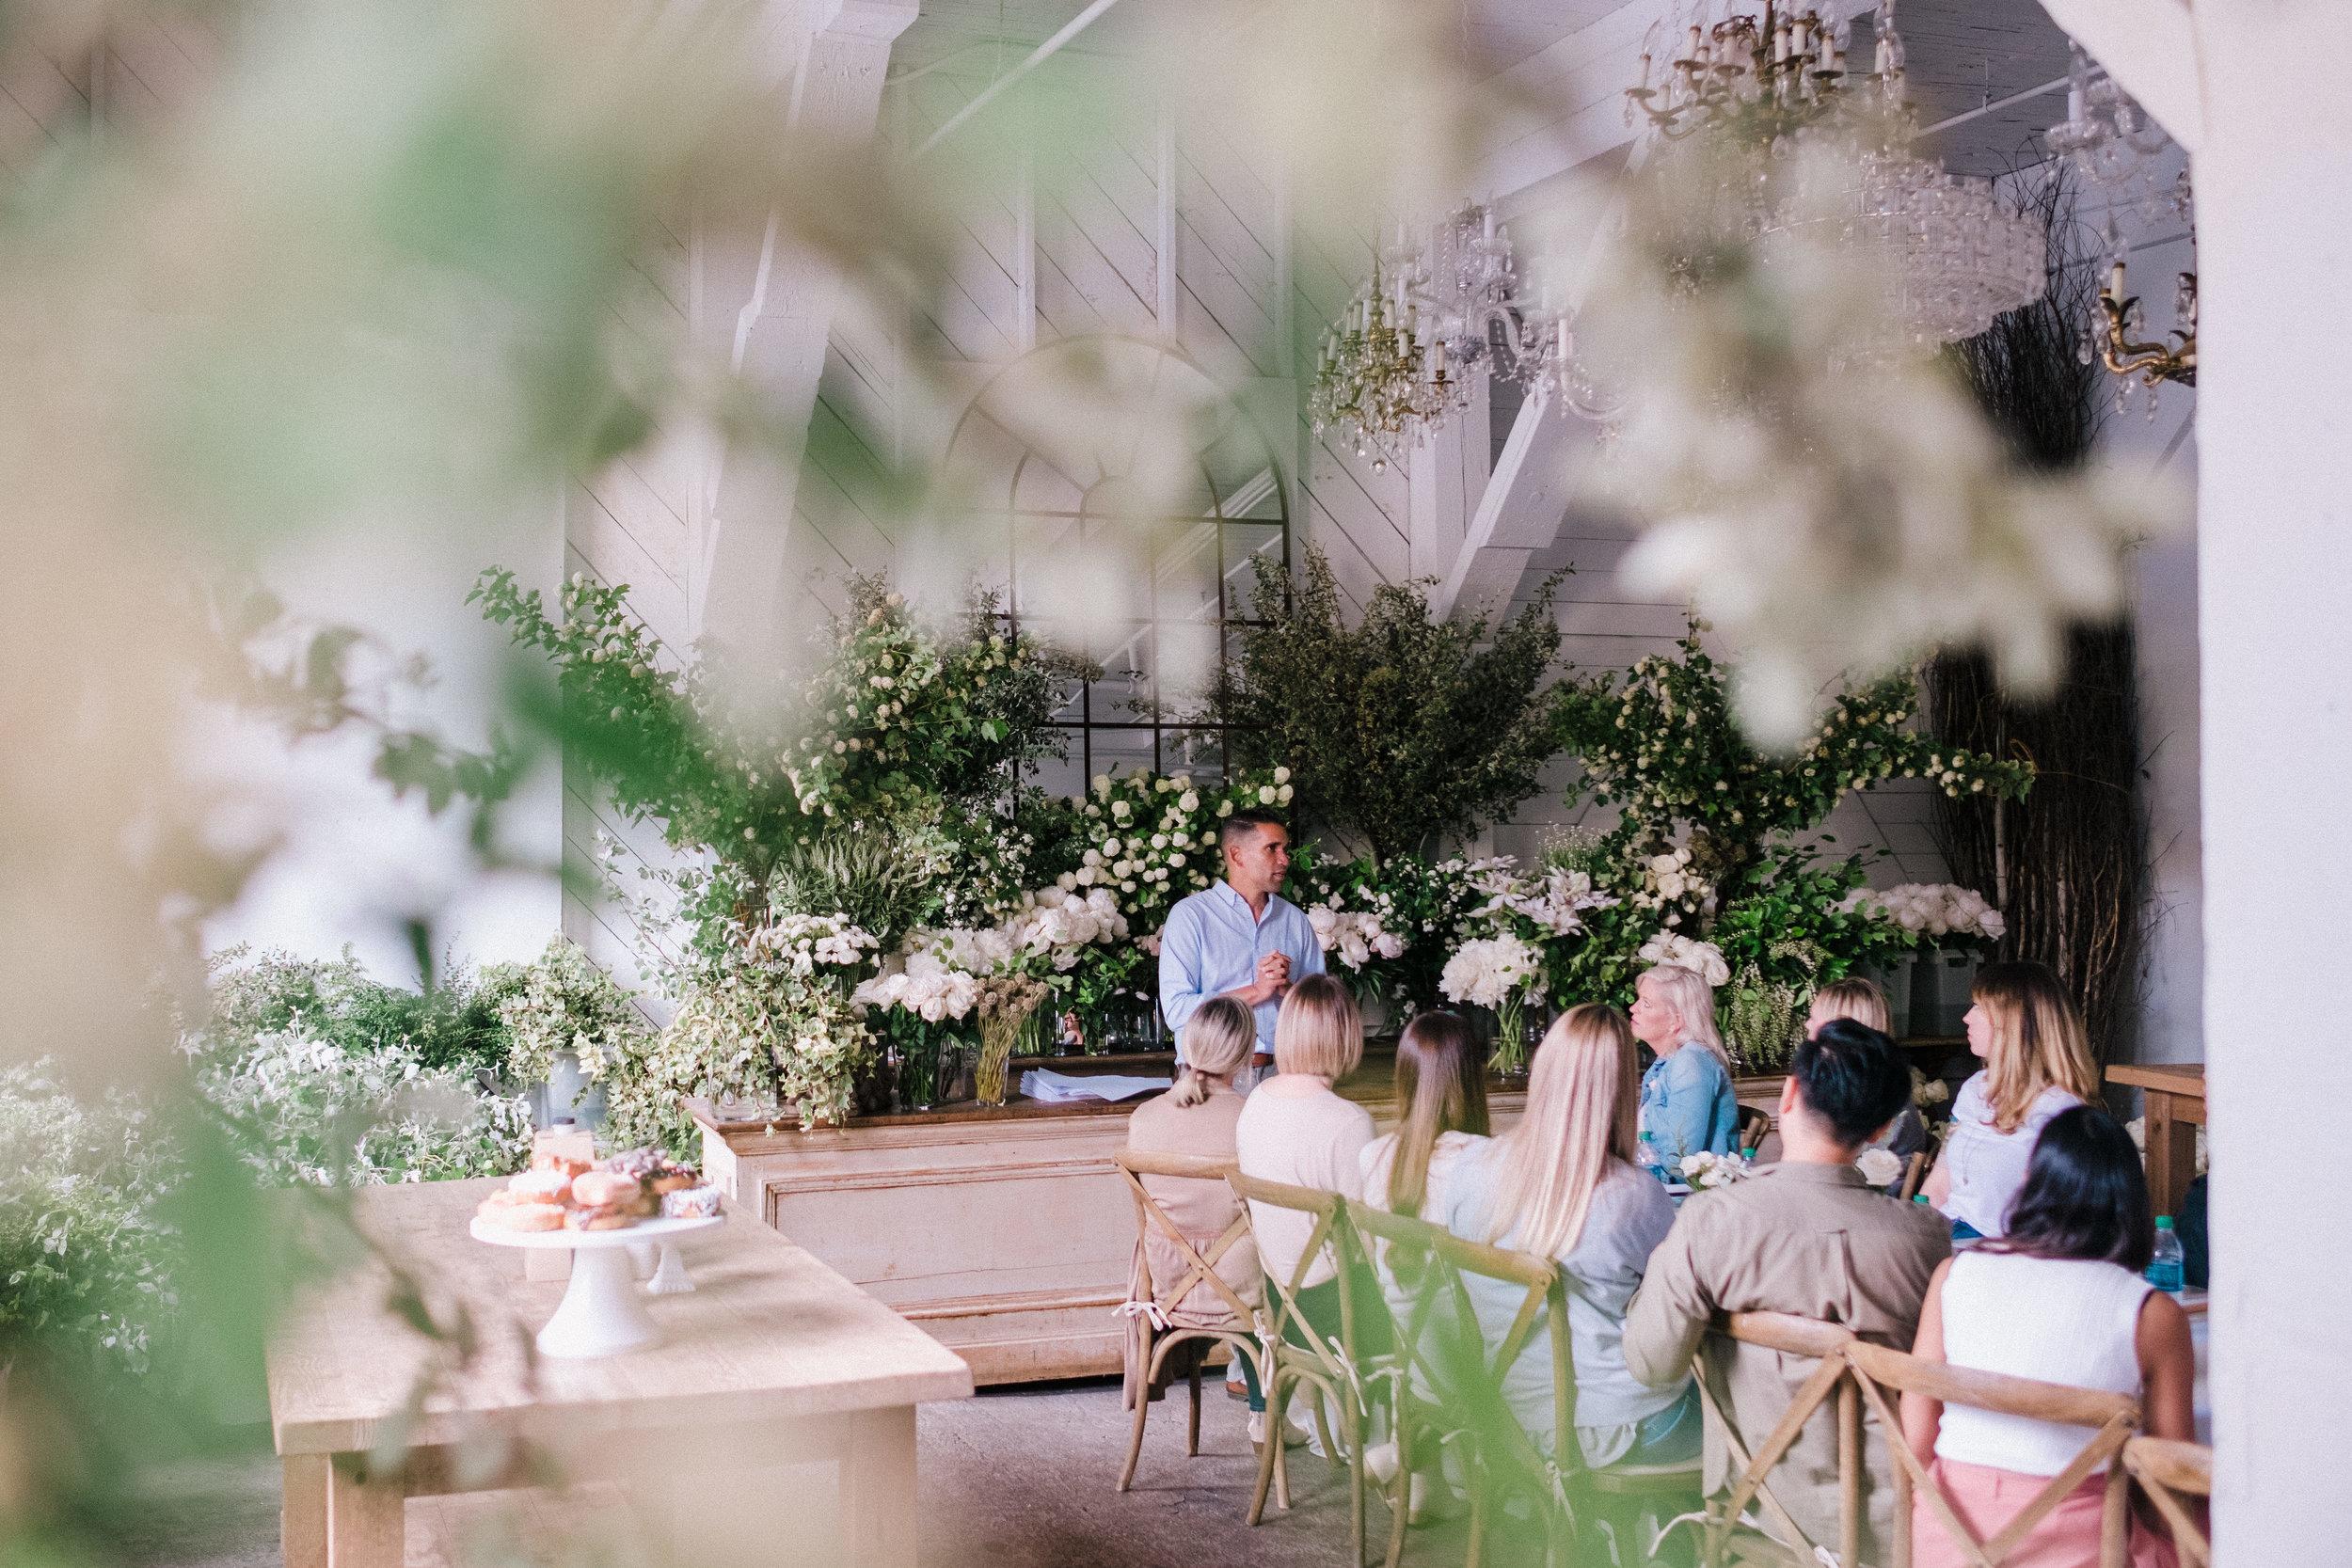 Our Experience at the Sinclair & Moore Real Wedding Workshop in Seattle, WA - Konsider It Done- AZ Arizona Wedding & Event Planner, Designer, Coordinator Planning in Scottsdale, Phoenix, Paradise Valley, Tempe, Gilbert, Mesa, Chandler, Tucson, Sedona, Seattle, Washington